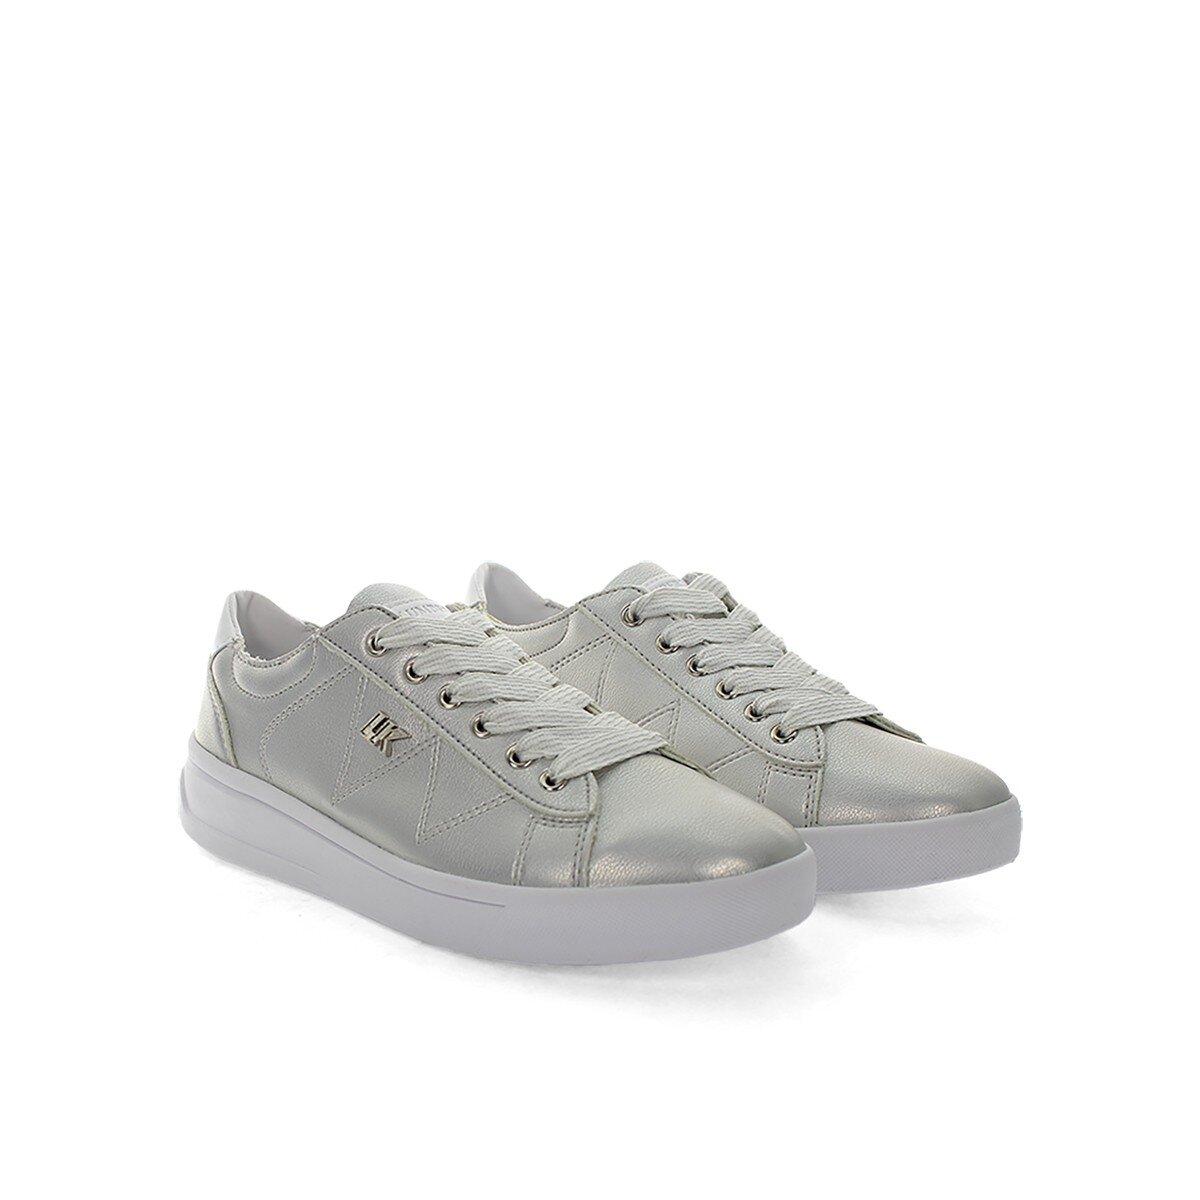 HAWK Sneakers Donna